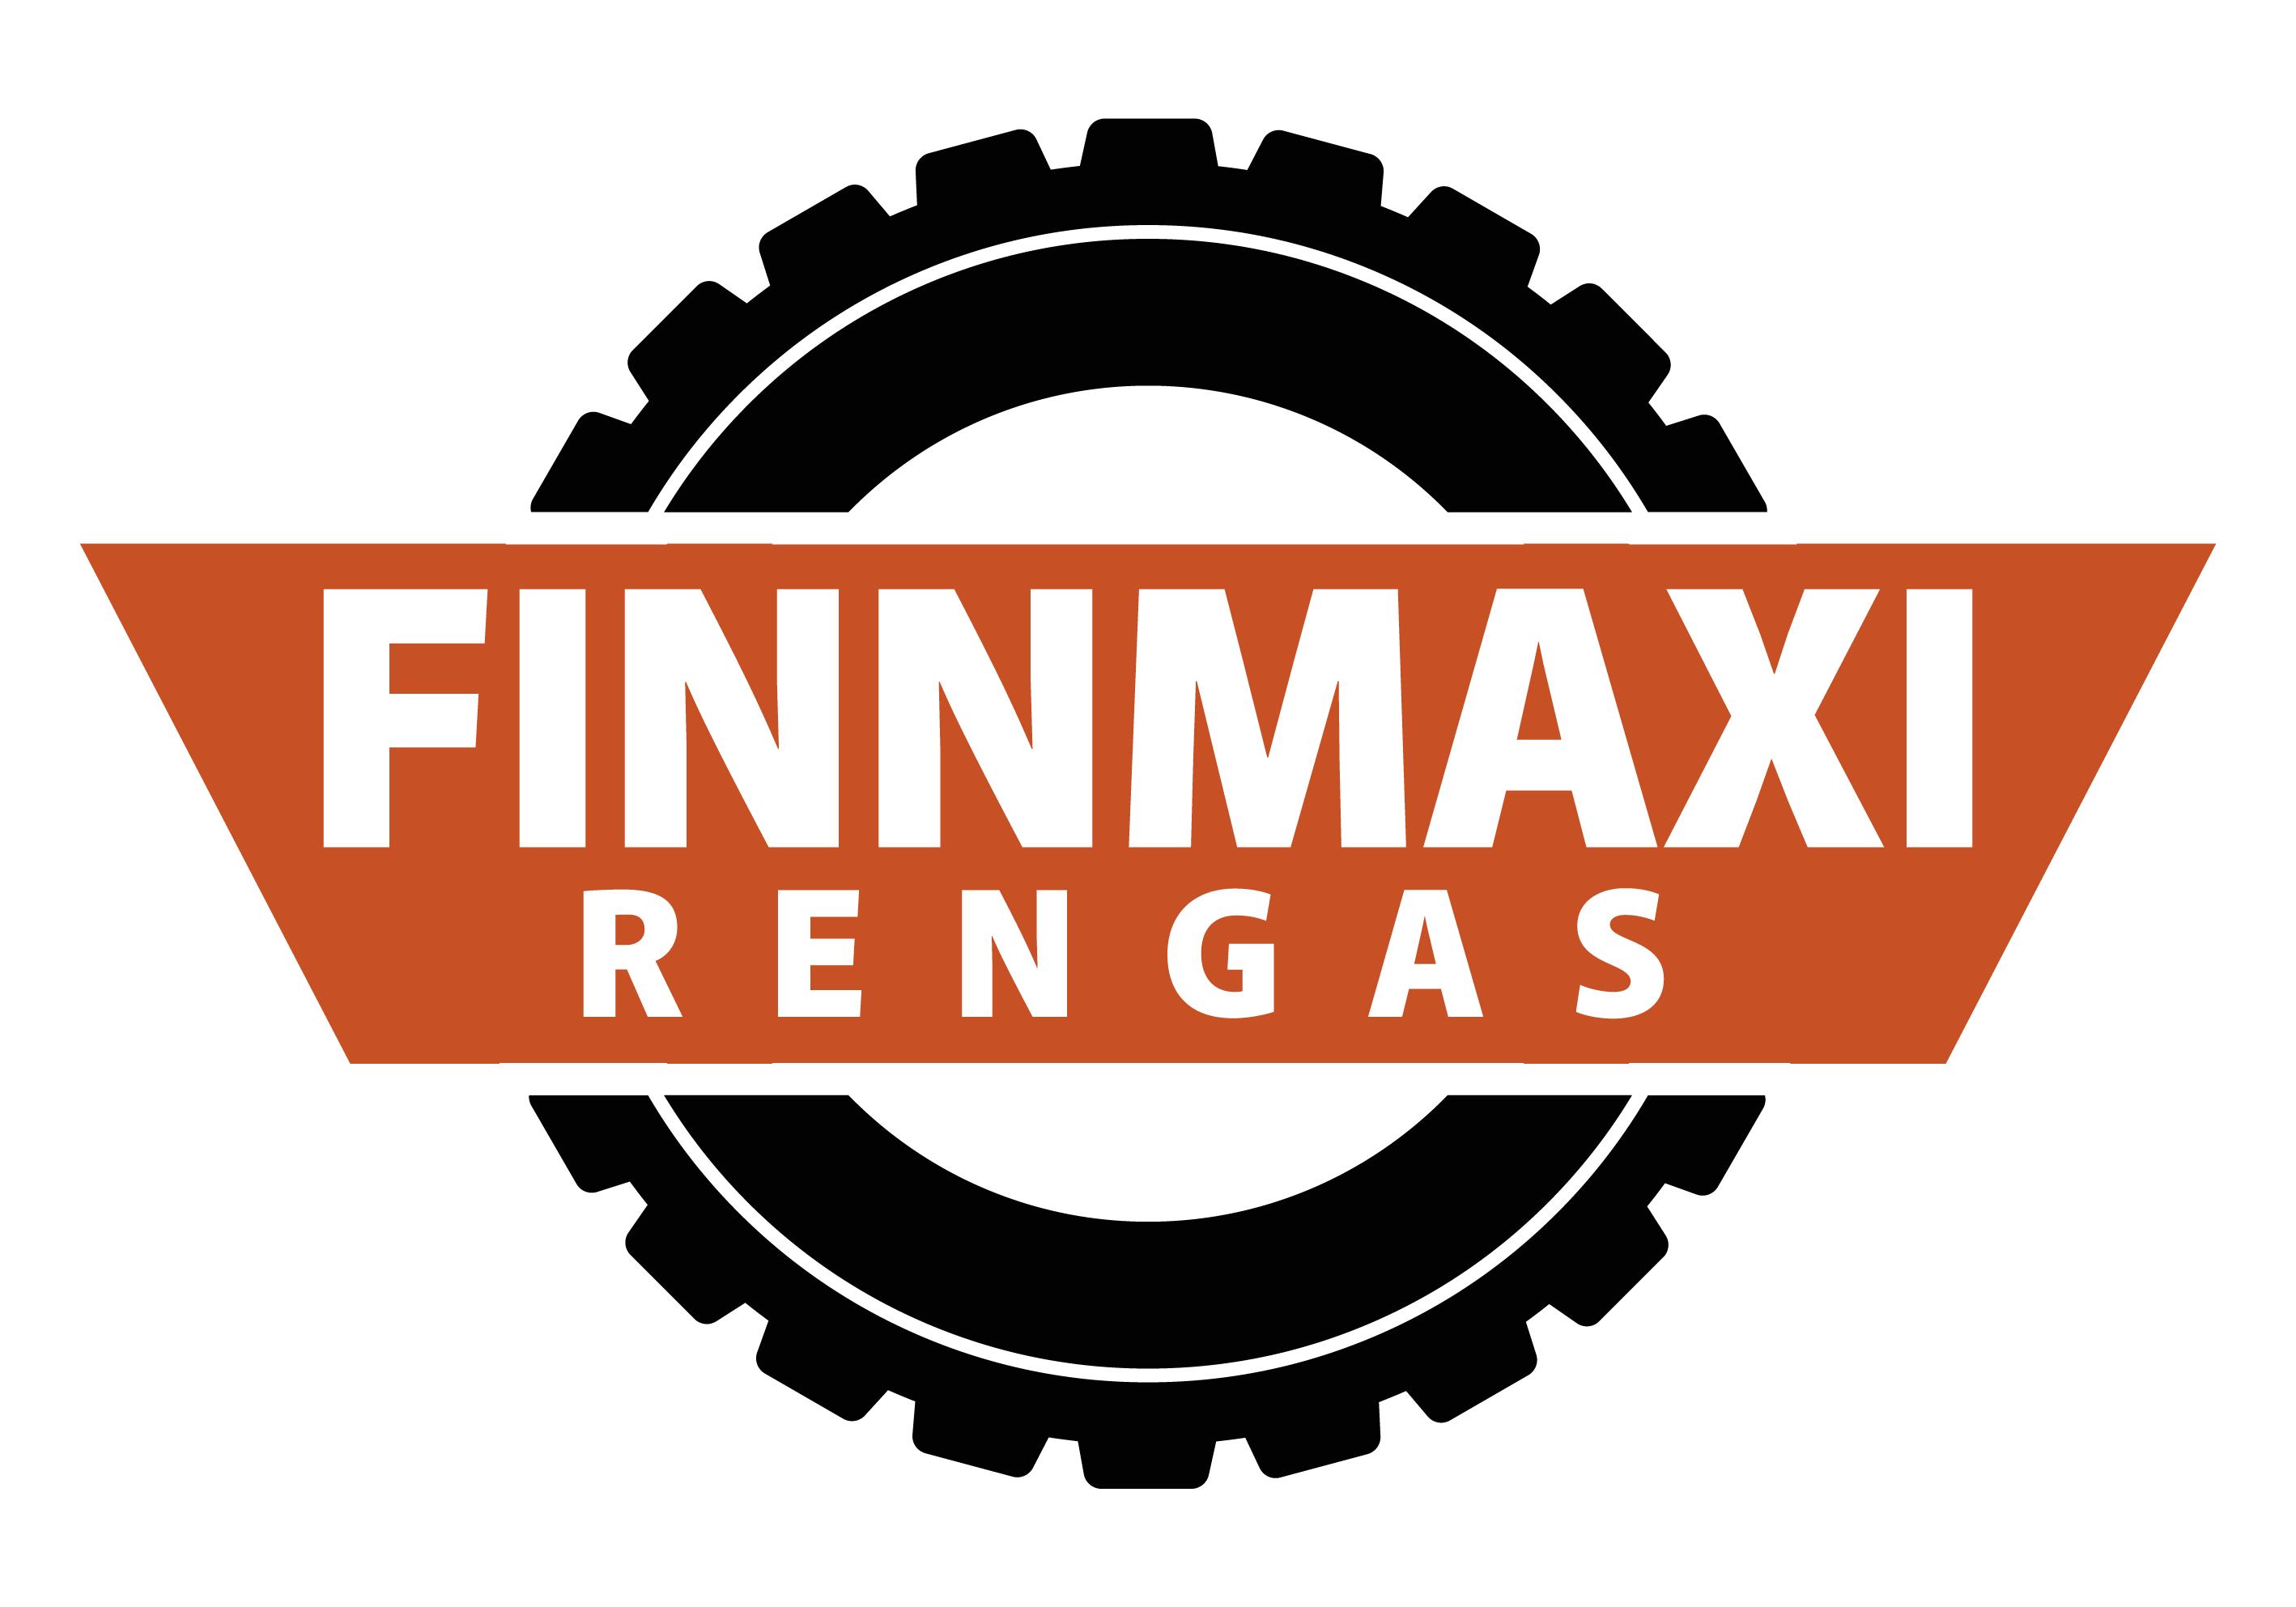 Etusivu | FinnMaxi rengas logo